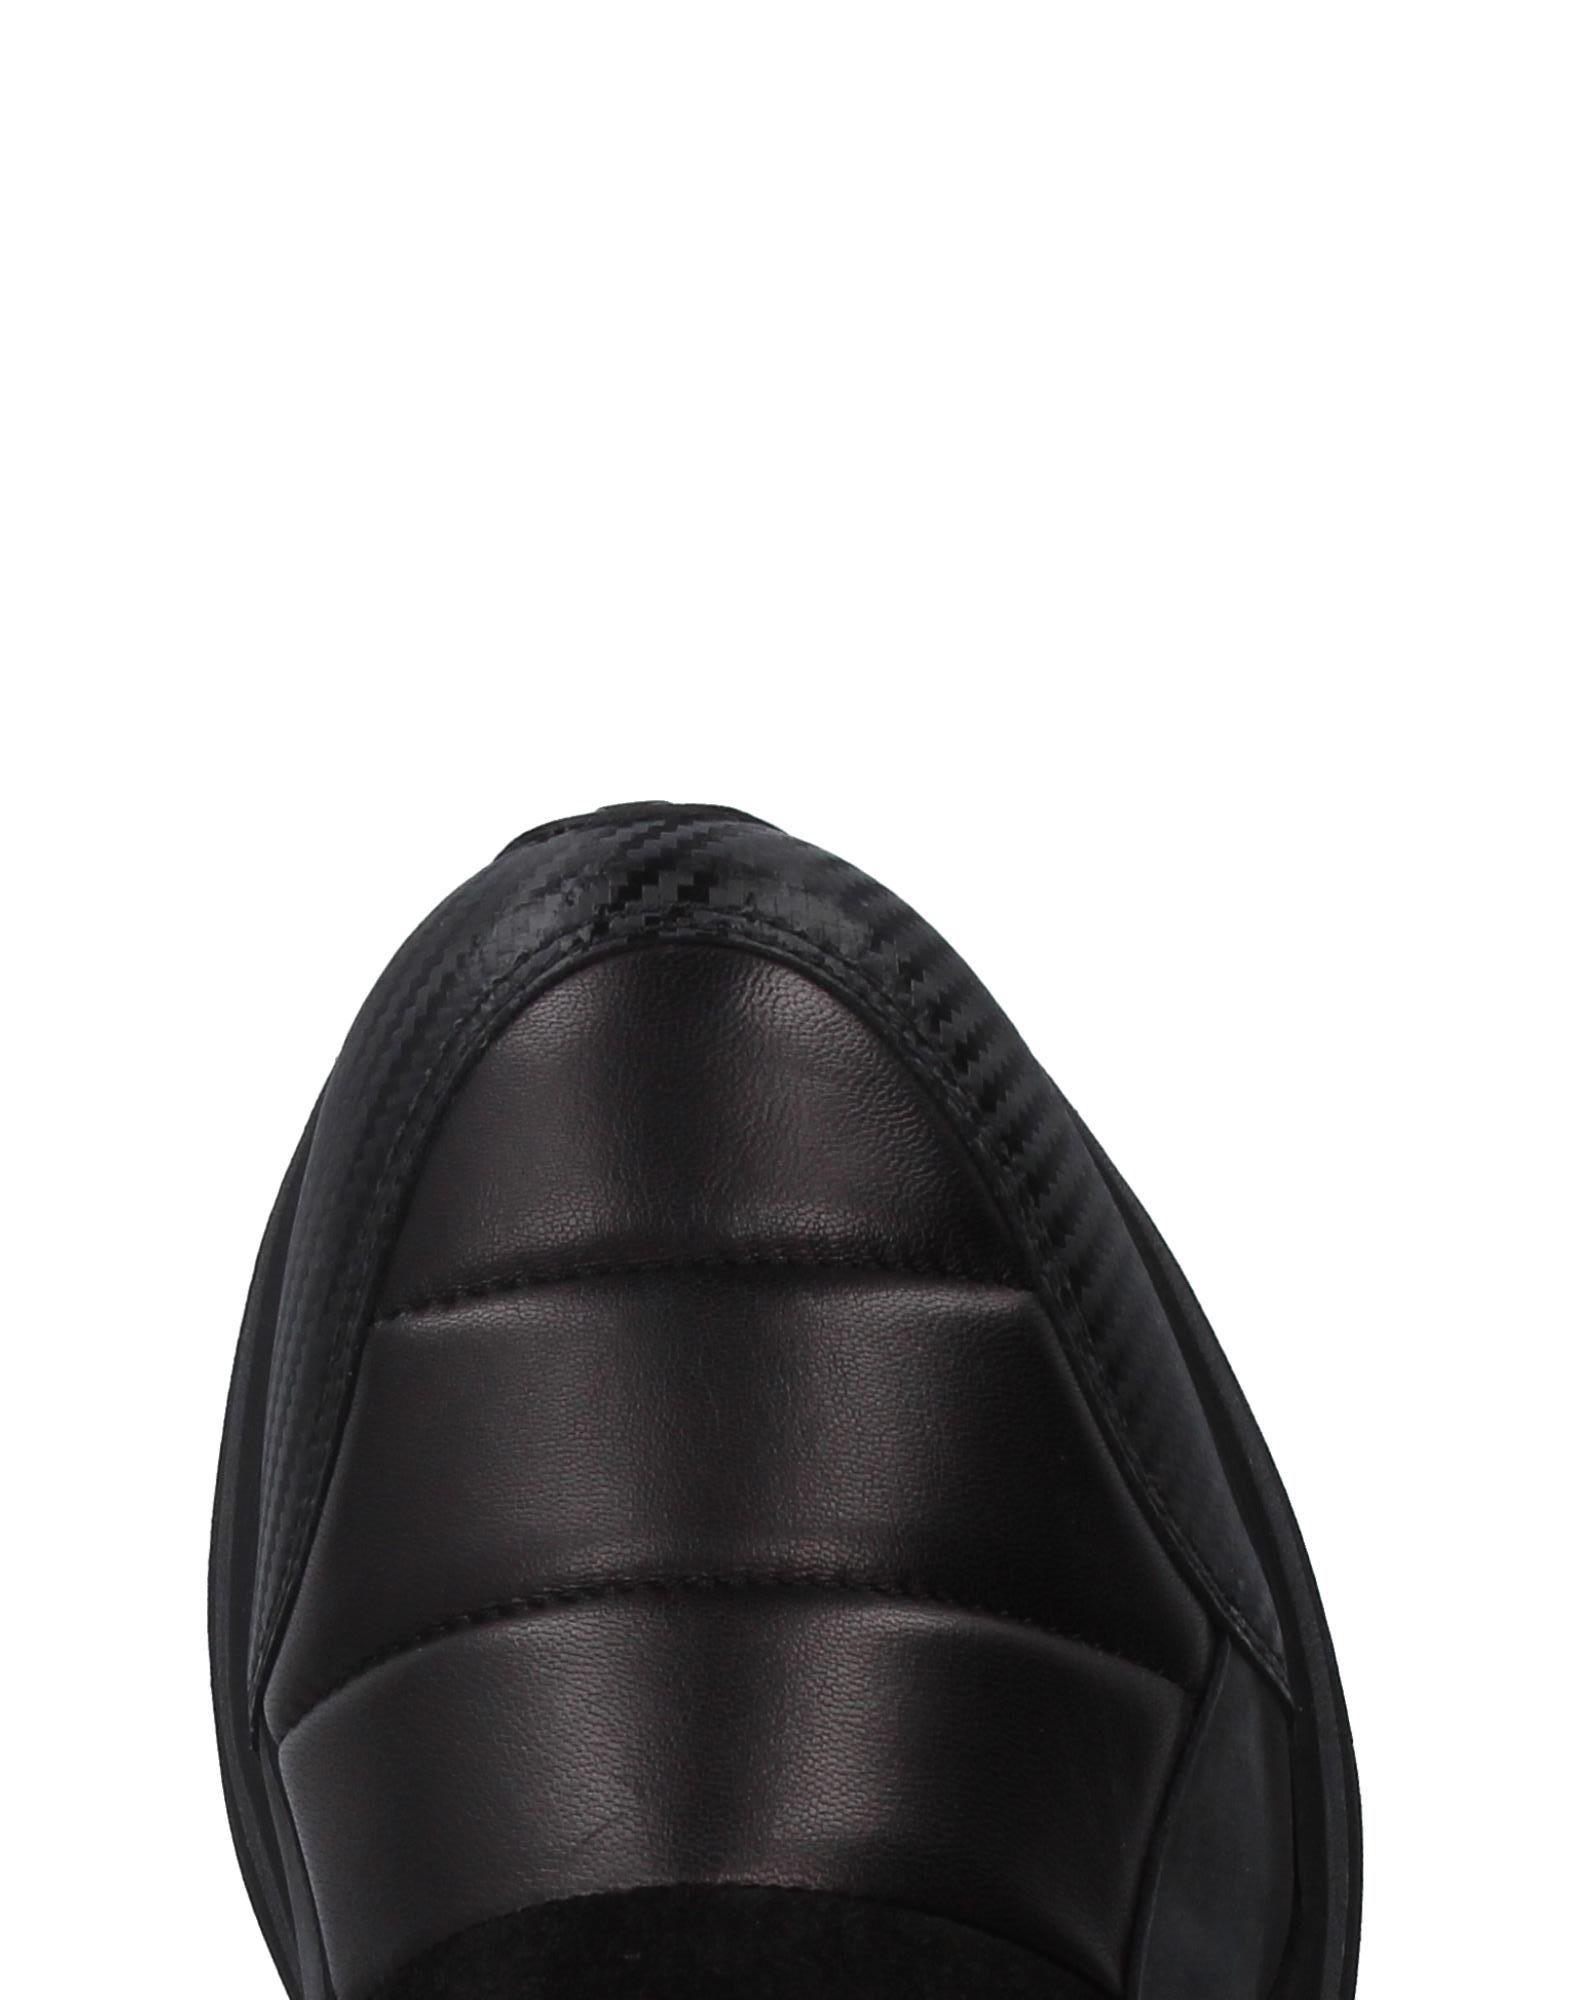 Dirk Bikkembergs Sneakers Sneakers Bikkembergs Herren  11220166TG 099fc7